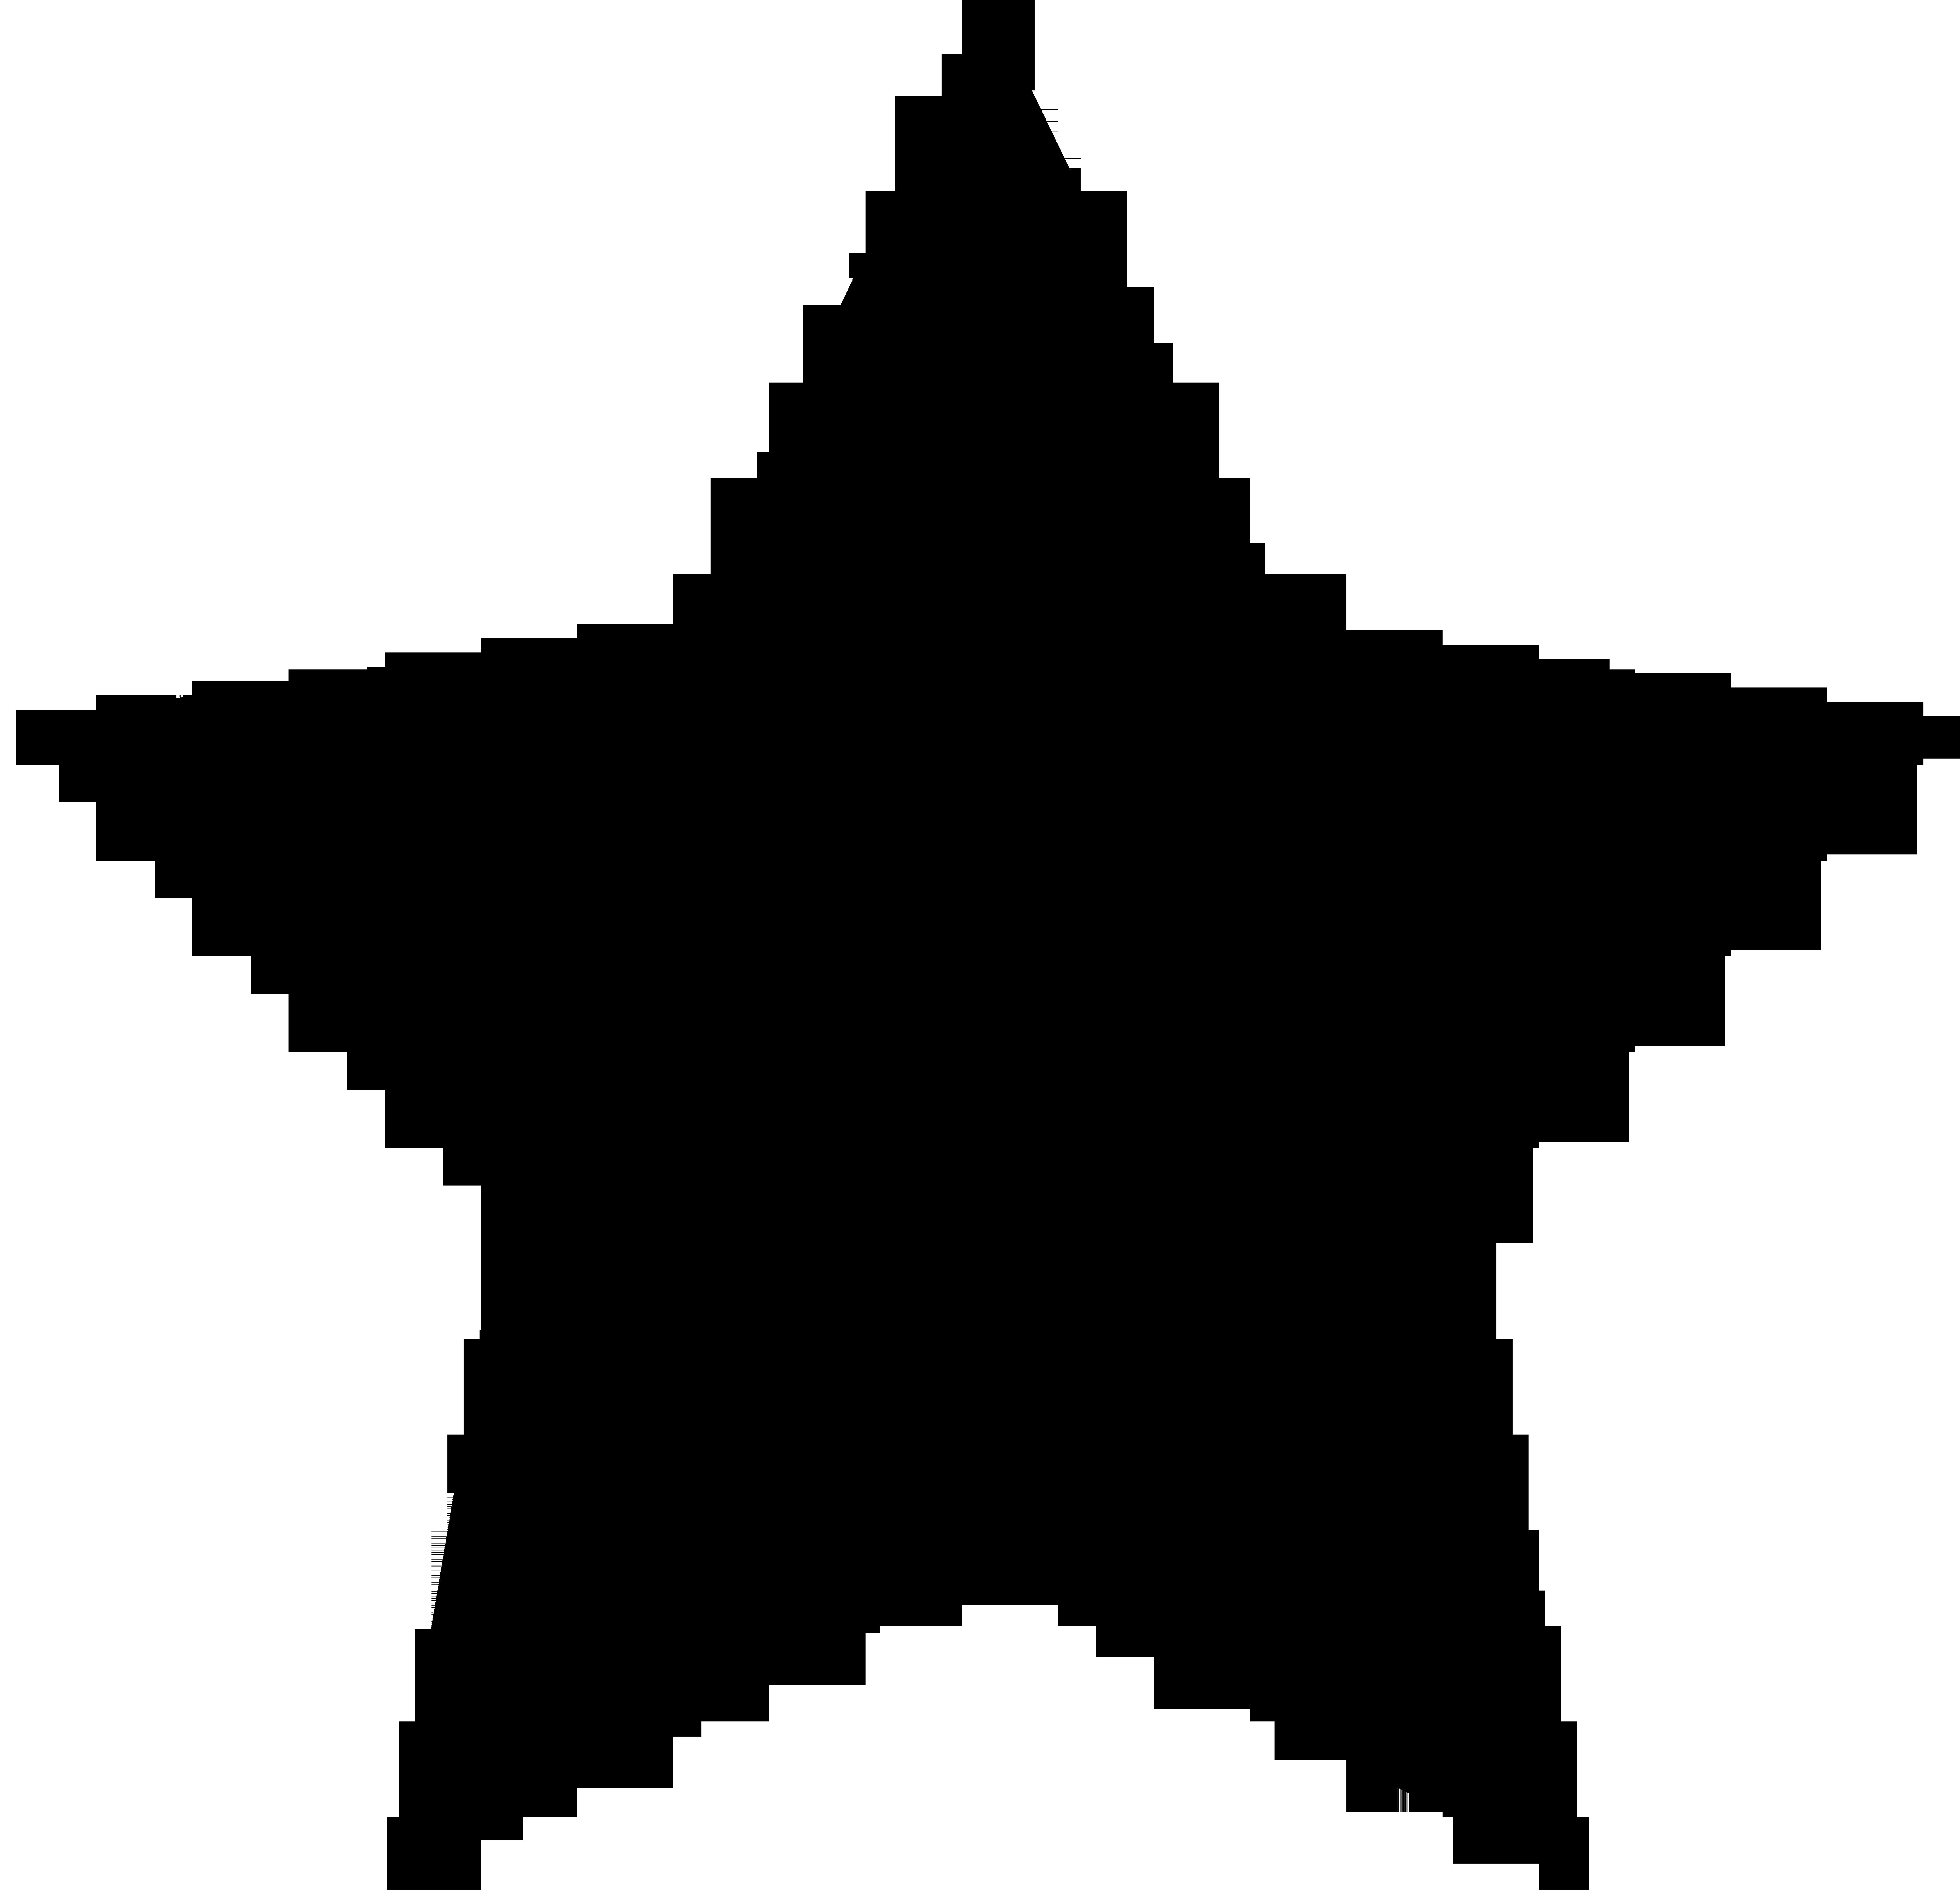 Big black star symbol. Ladybug clipart symmetrical